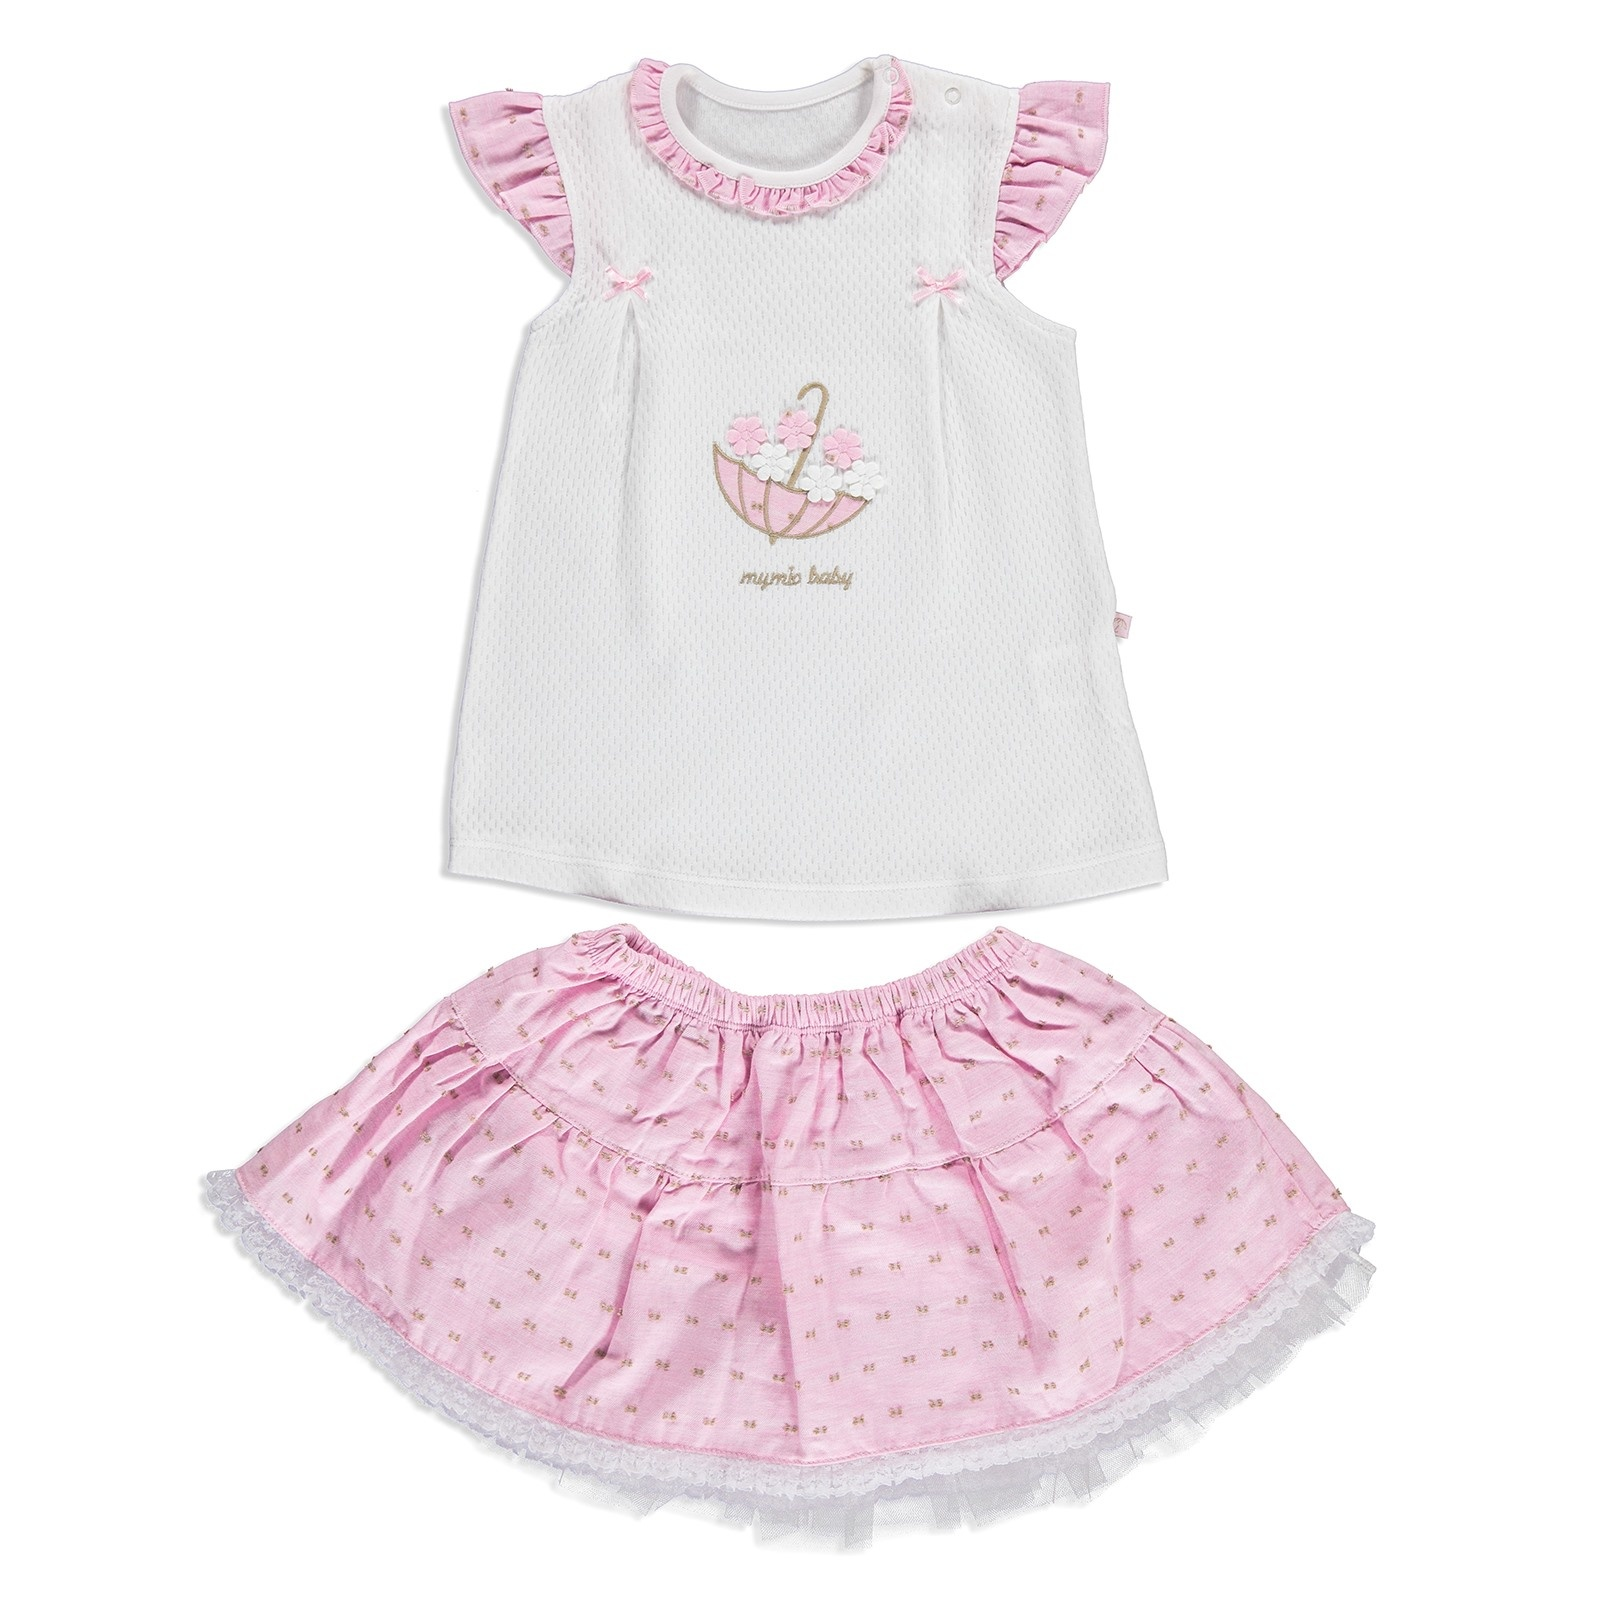 Ebebek Mymio Summer Baby Girl Flower Umbrella Poplin Short Sleeve T-shirt 2 Pcs Set